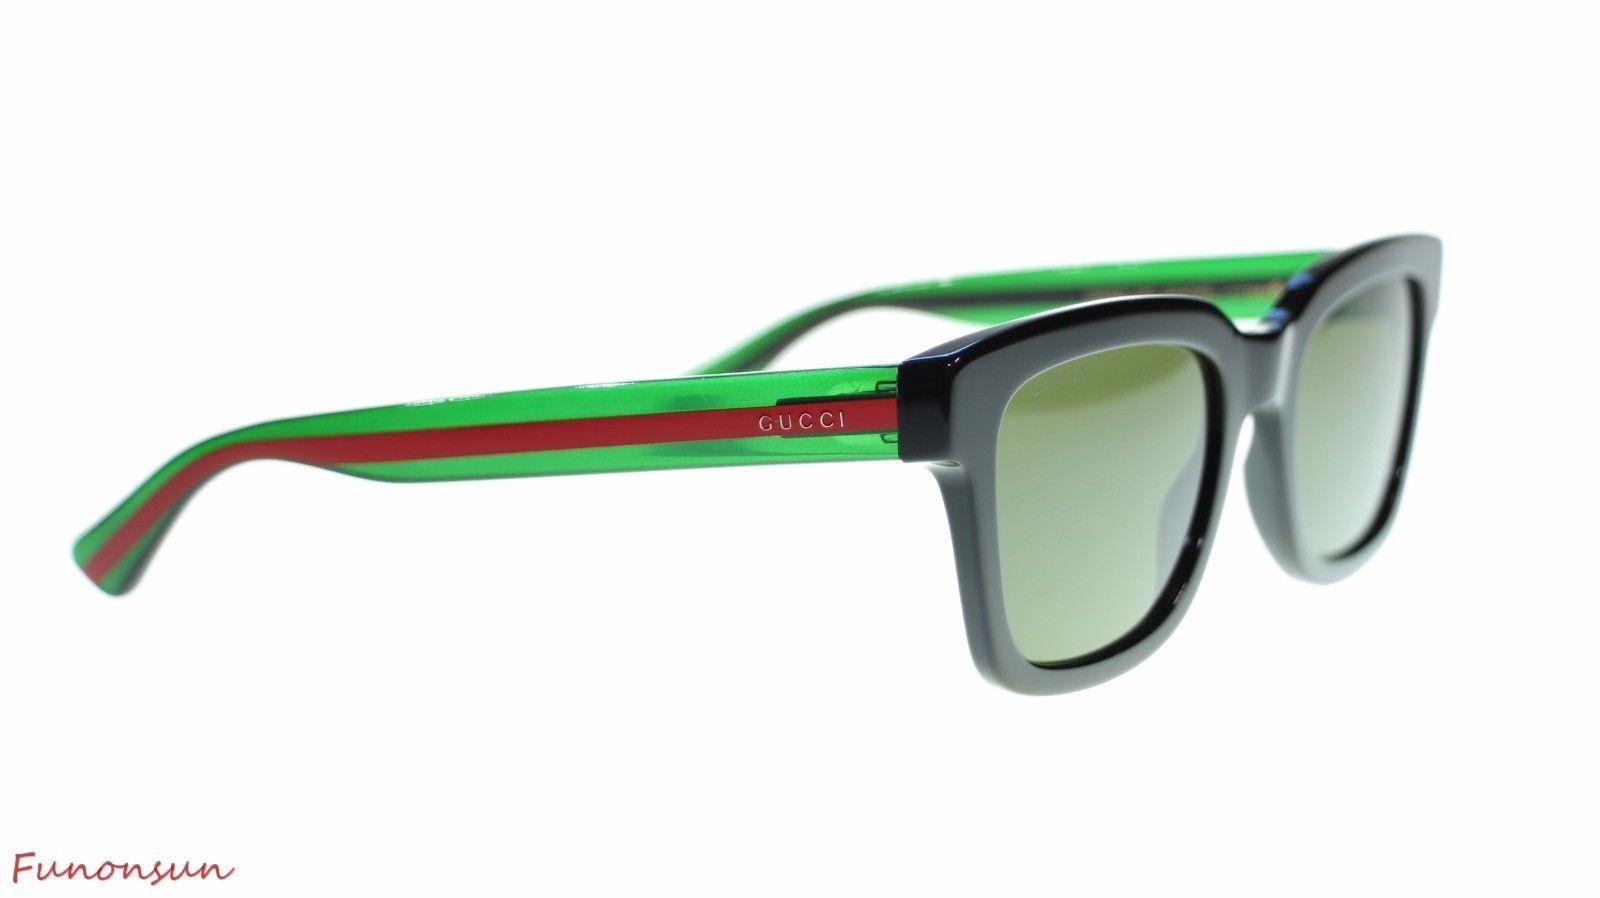 2c0c89d279 Gucci Men Square Sunglasses GG0001S 002 Black Green Green Lens 52mm  Authentic